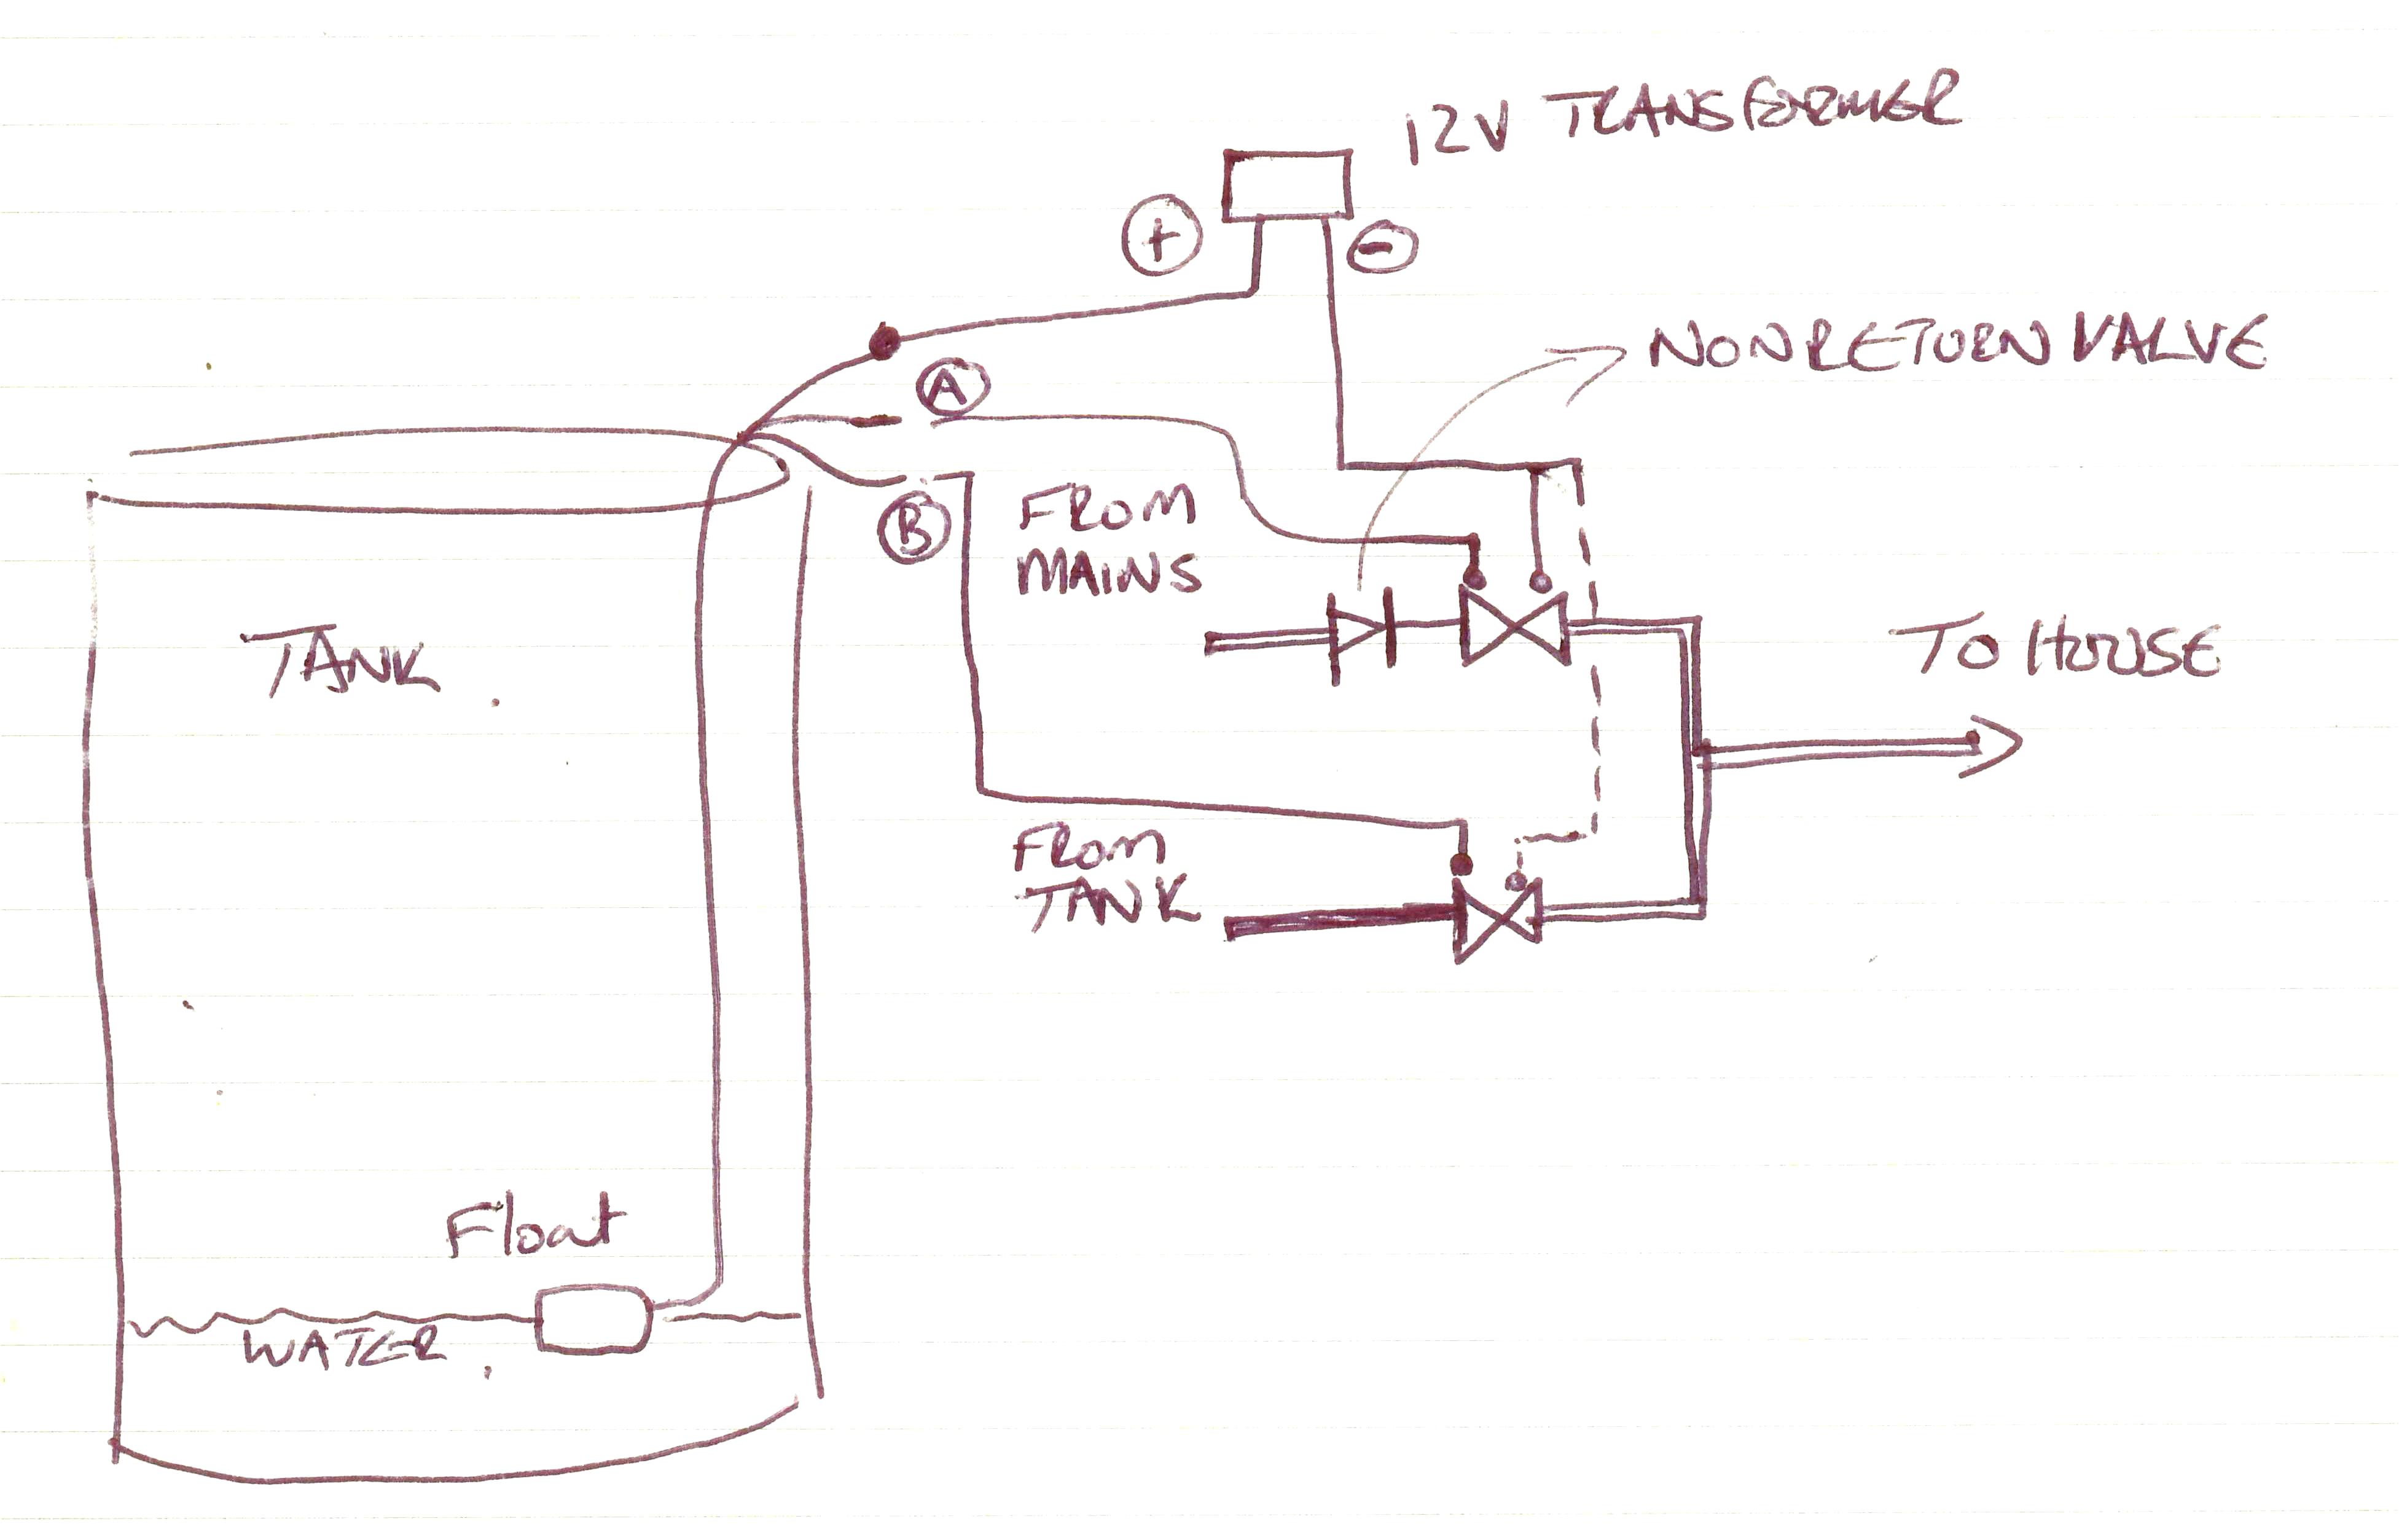 float valve wiring diagram wiring diagramfloat valve wiring diagram wiring diagram data float valve wiring diagram